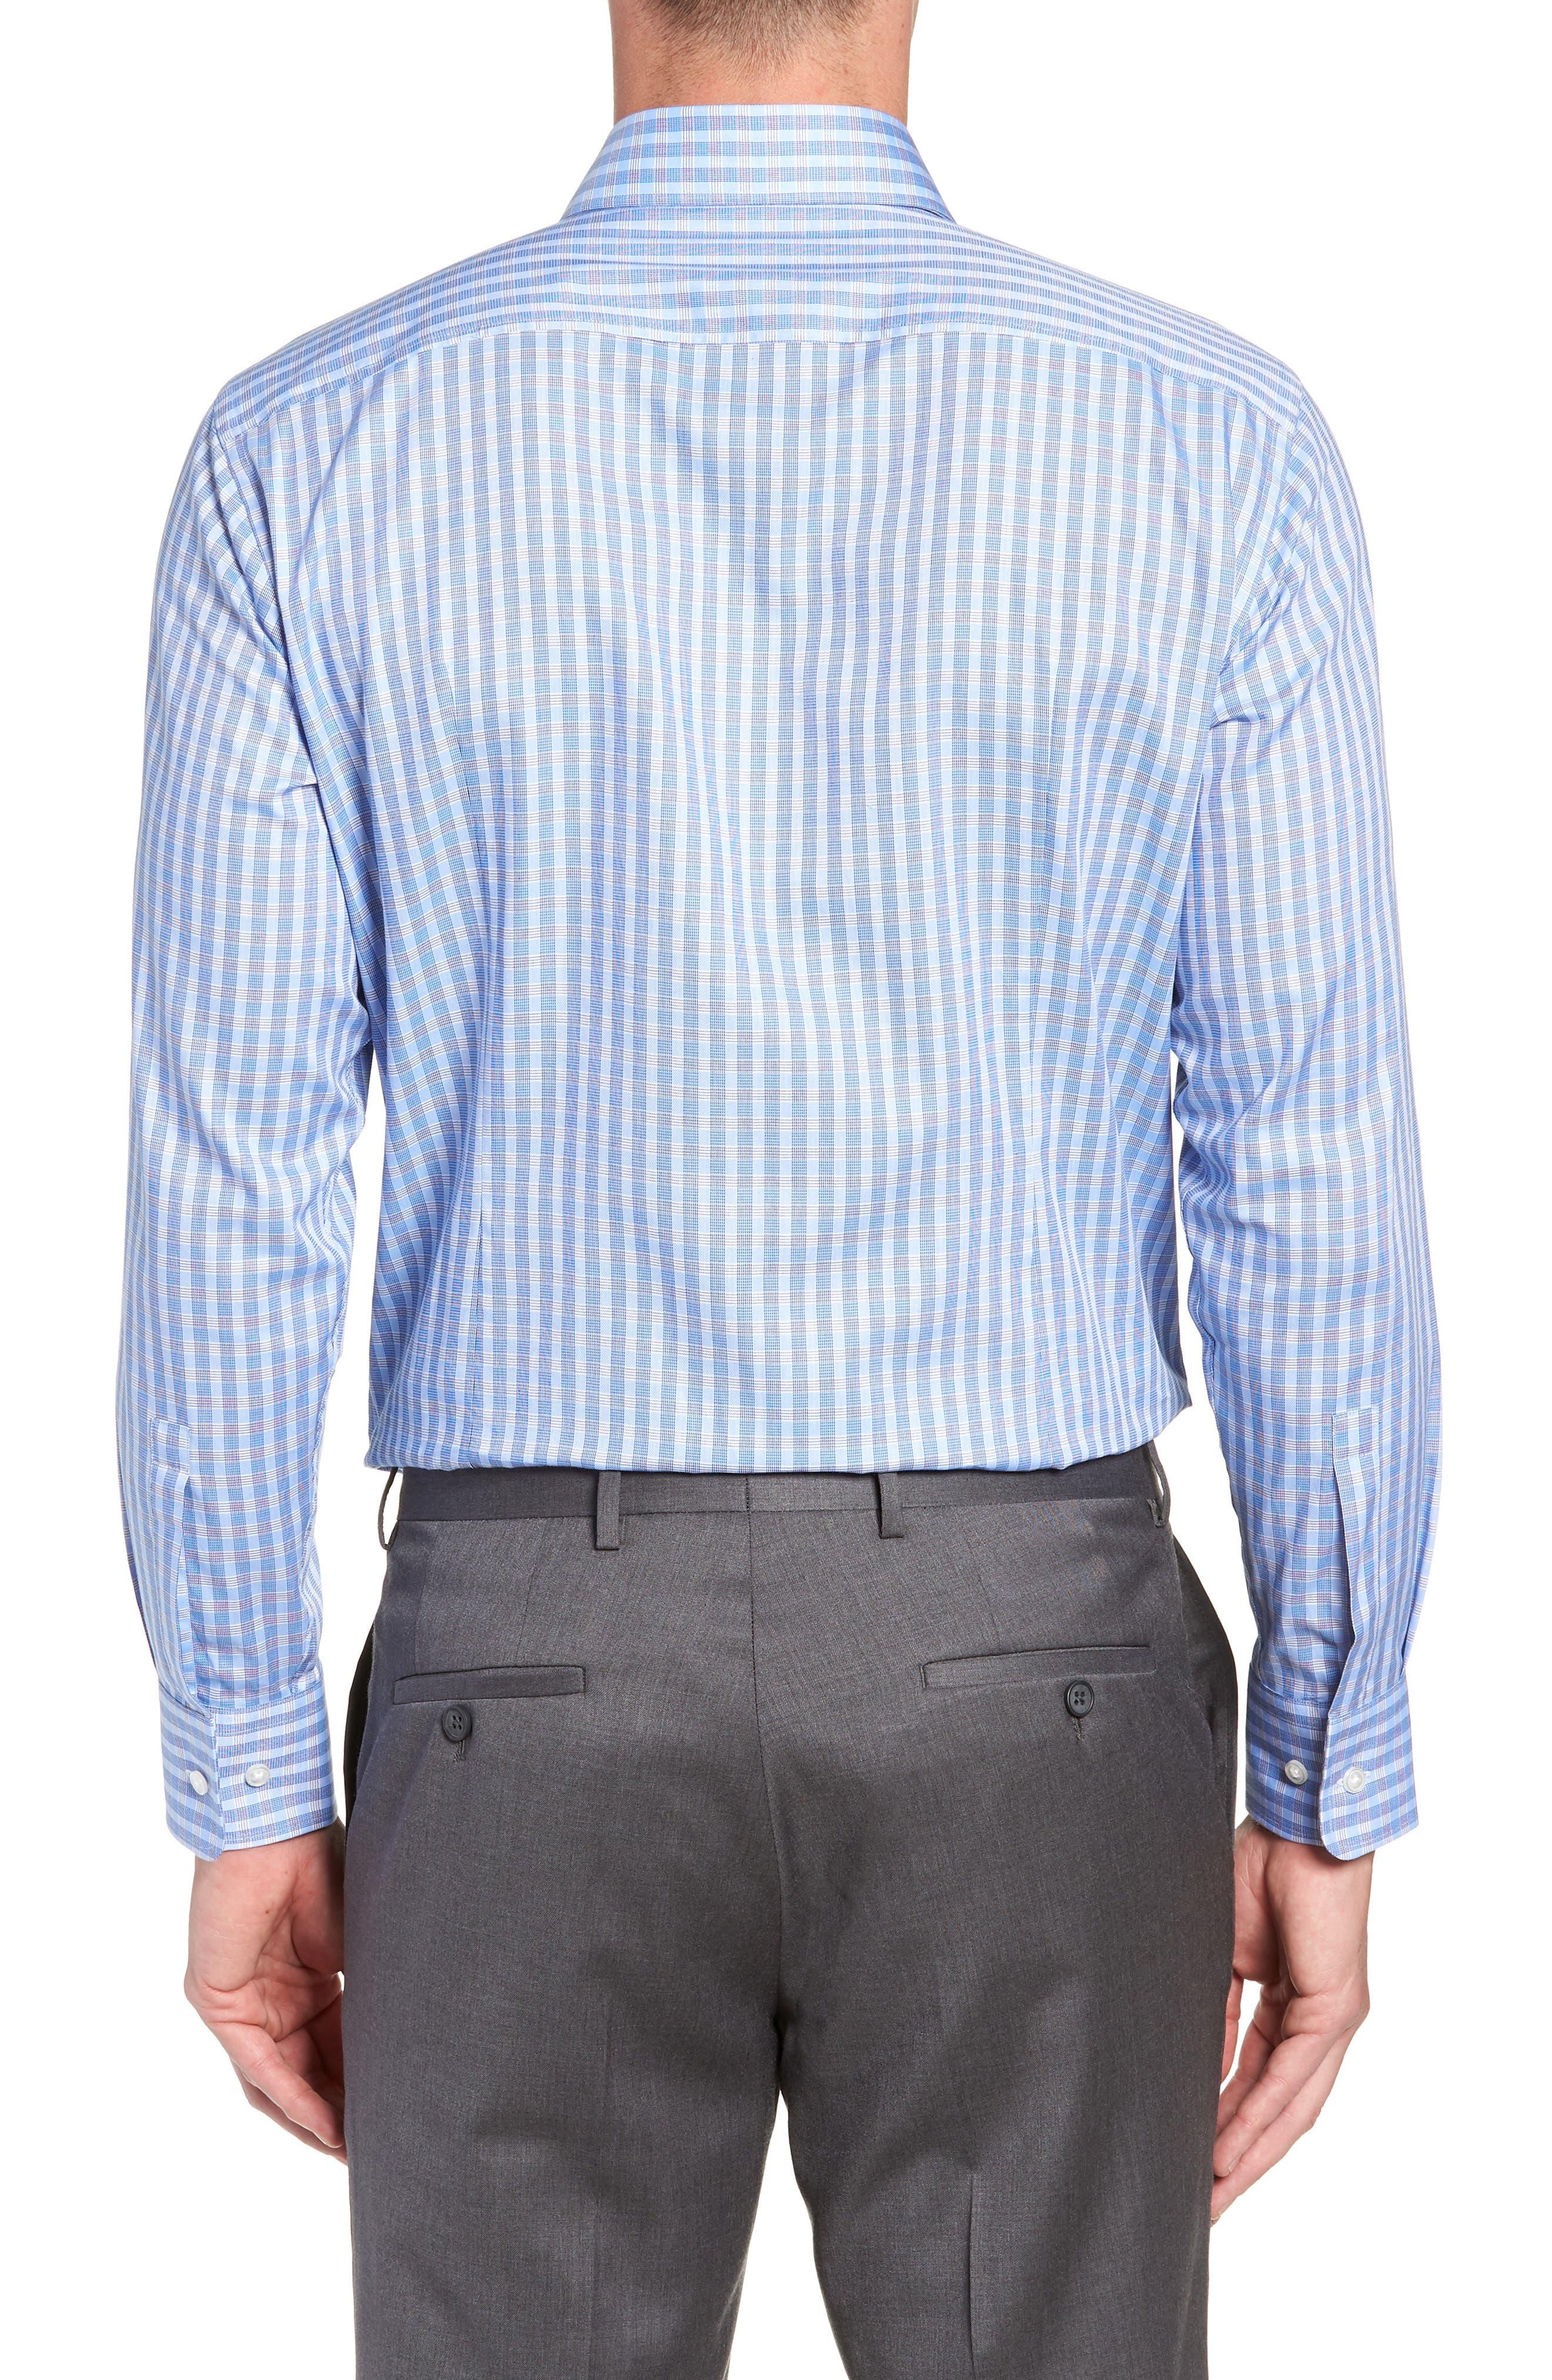 BOSS, Mark Sharp Fit Check Dress Shirt, Alternate thumbnail 3, color, BLUE